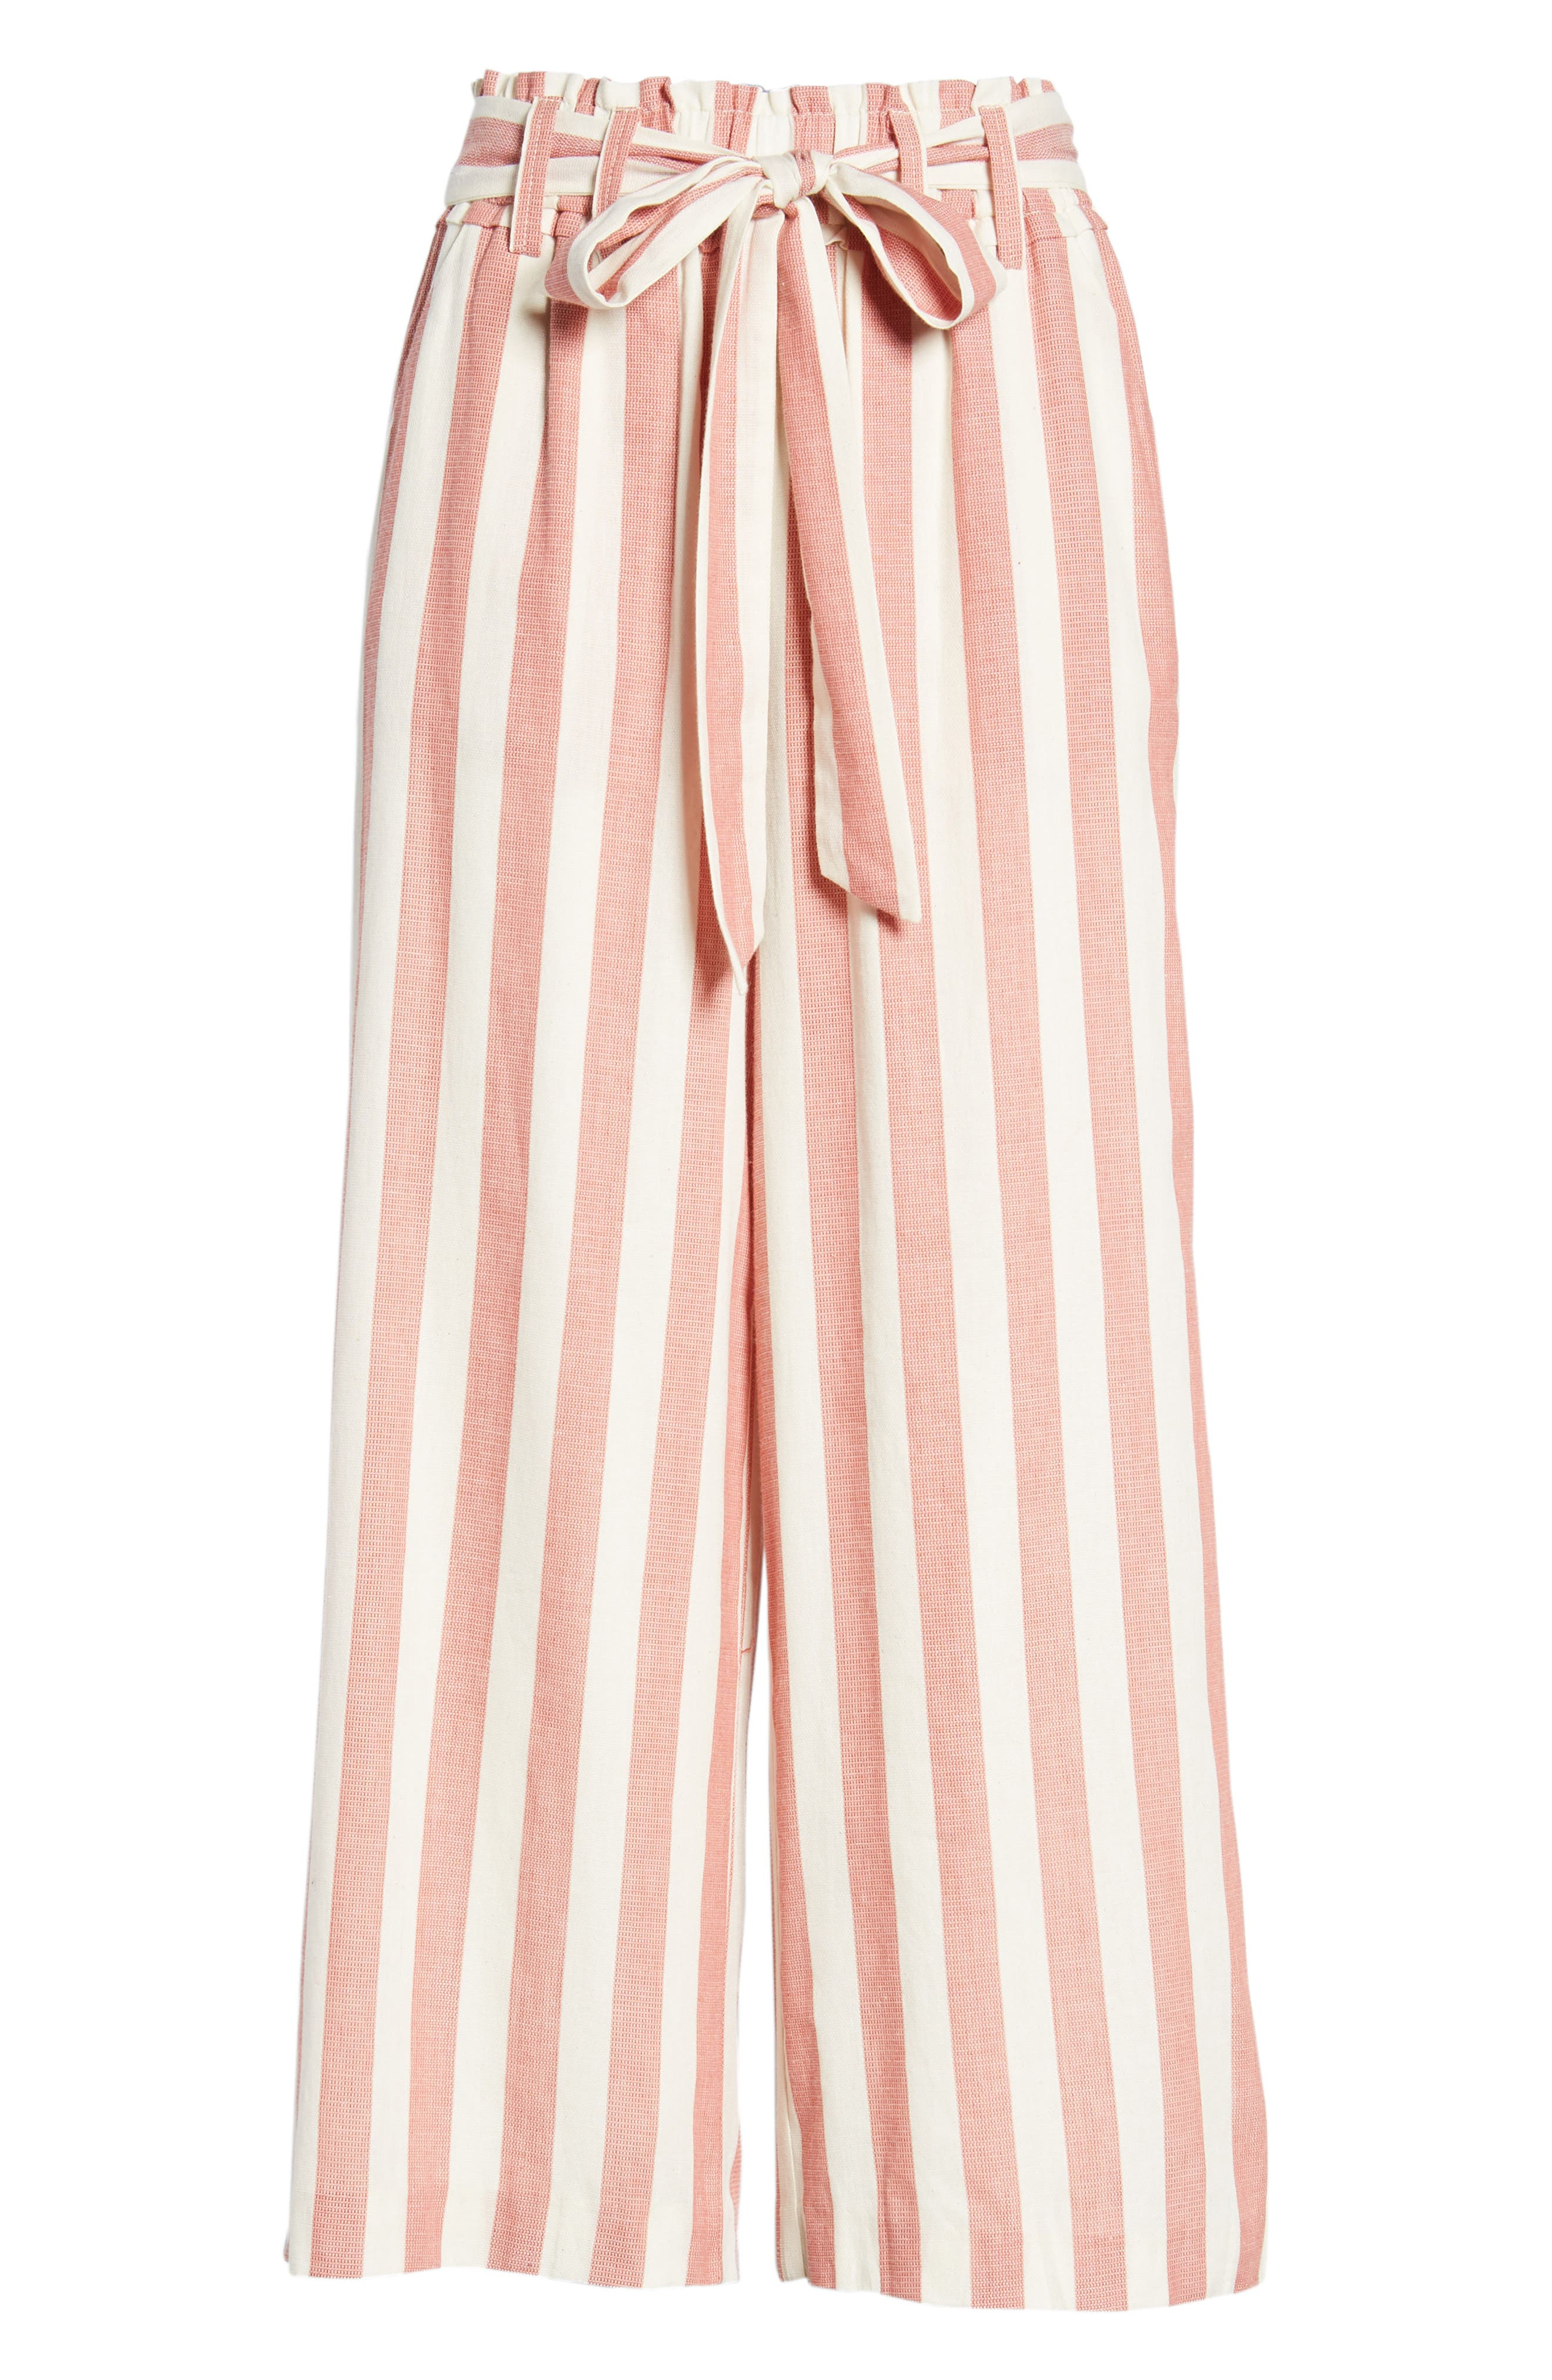 Stripe Paperbag Waist Pants,                             Alternate thumbnail 7, color,                             600